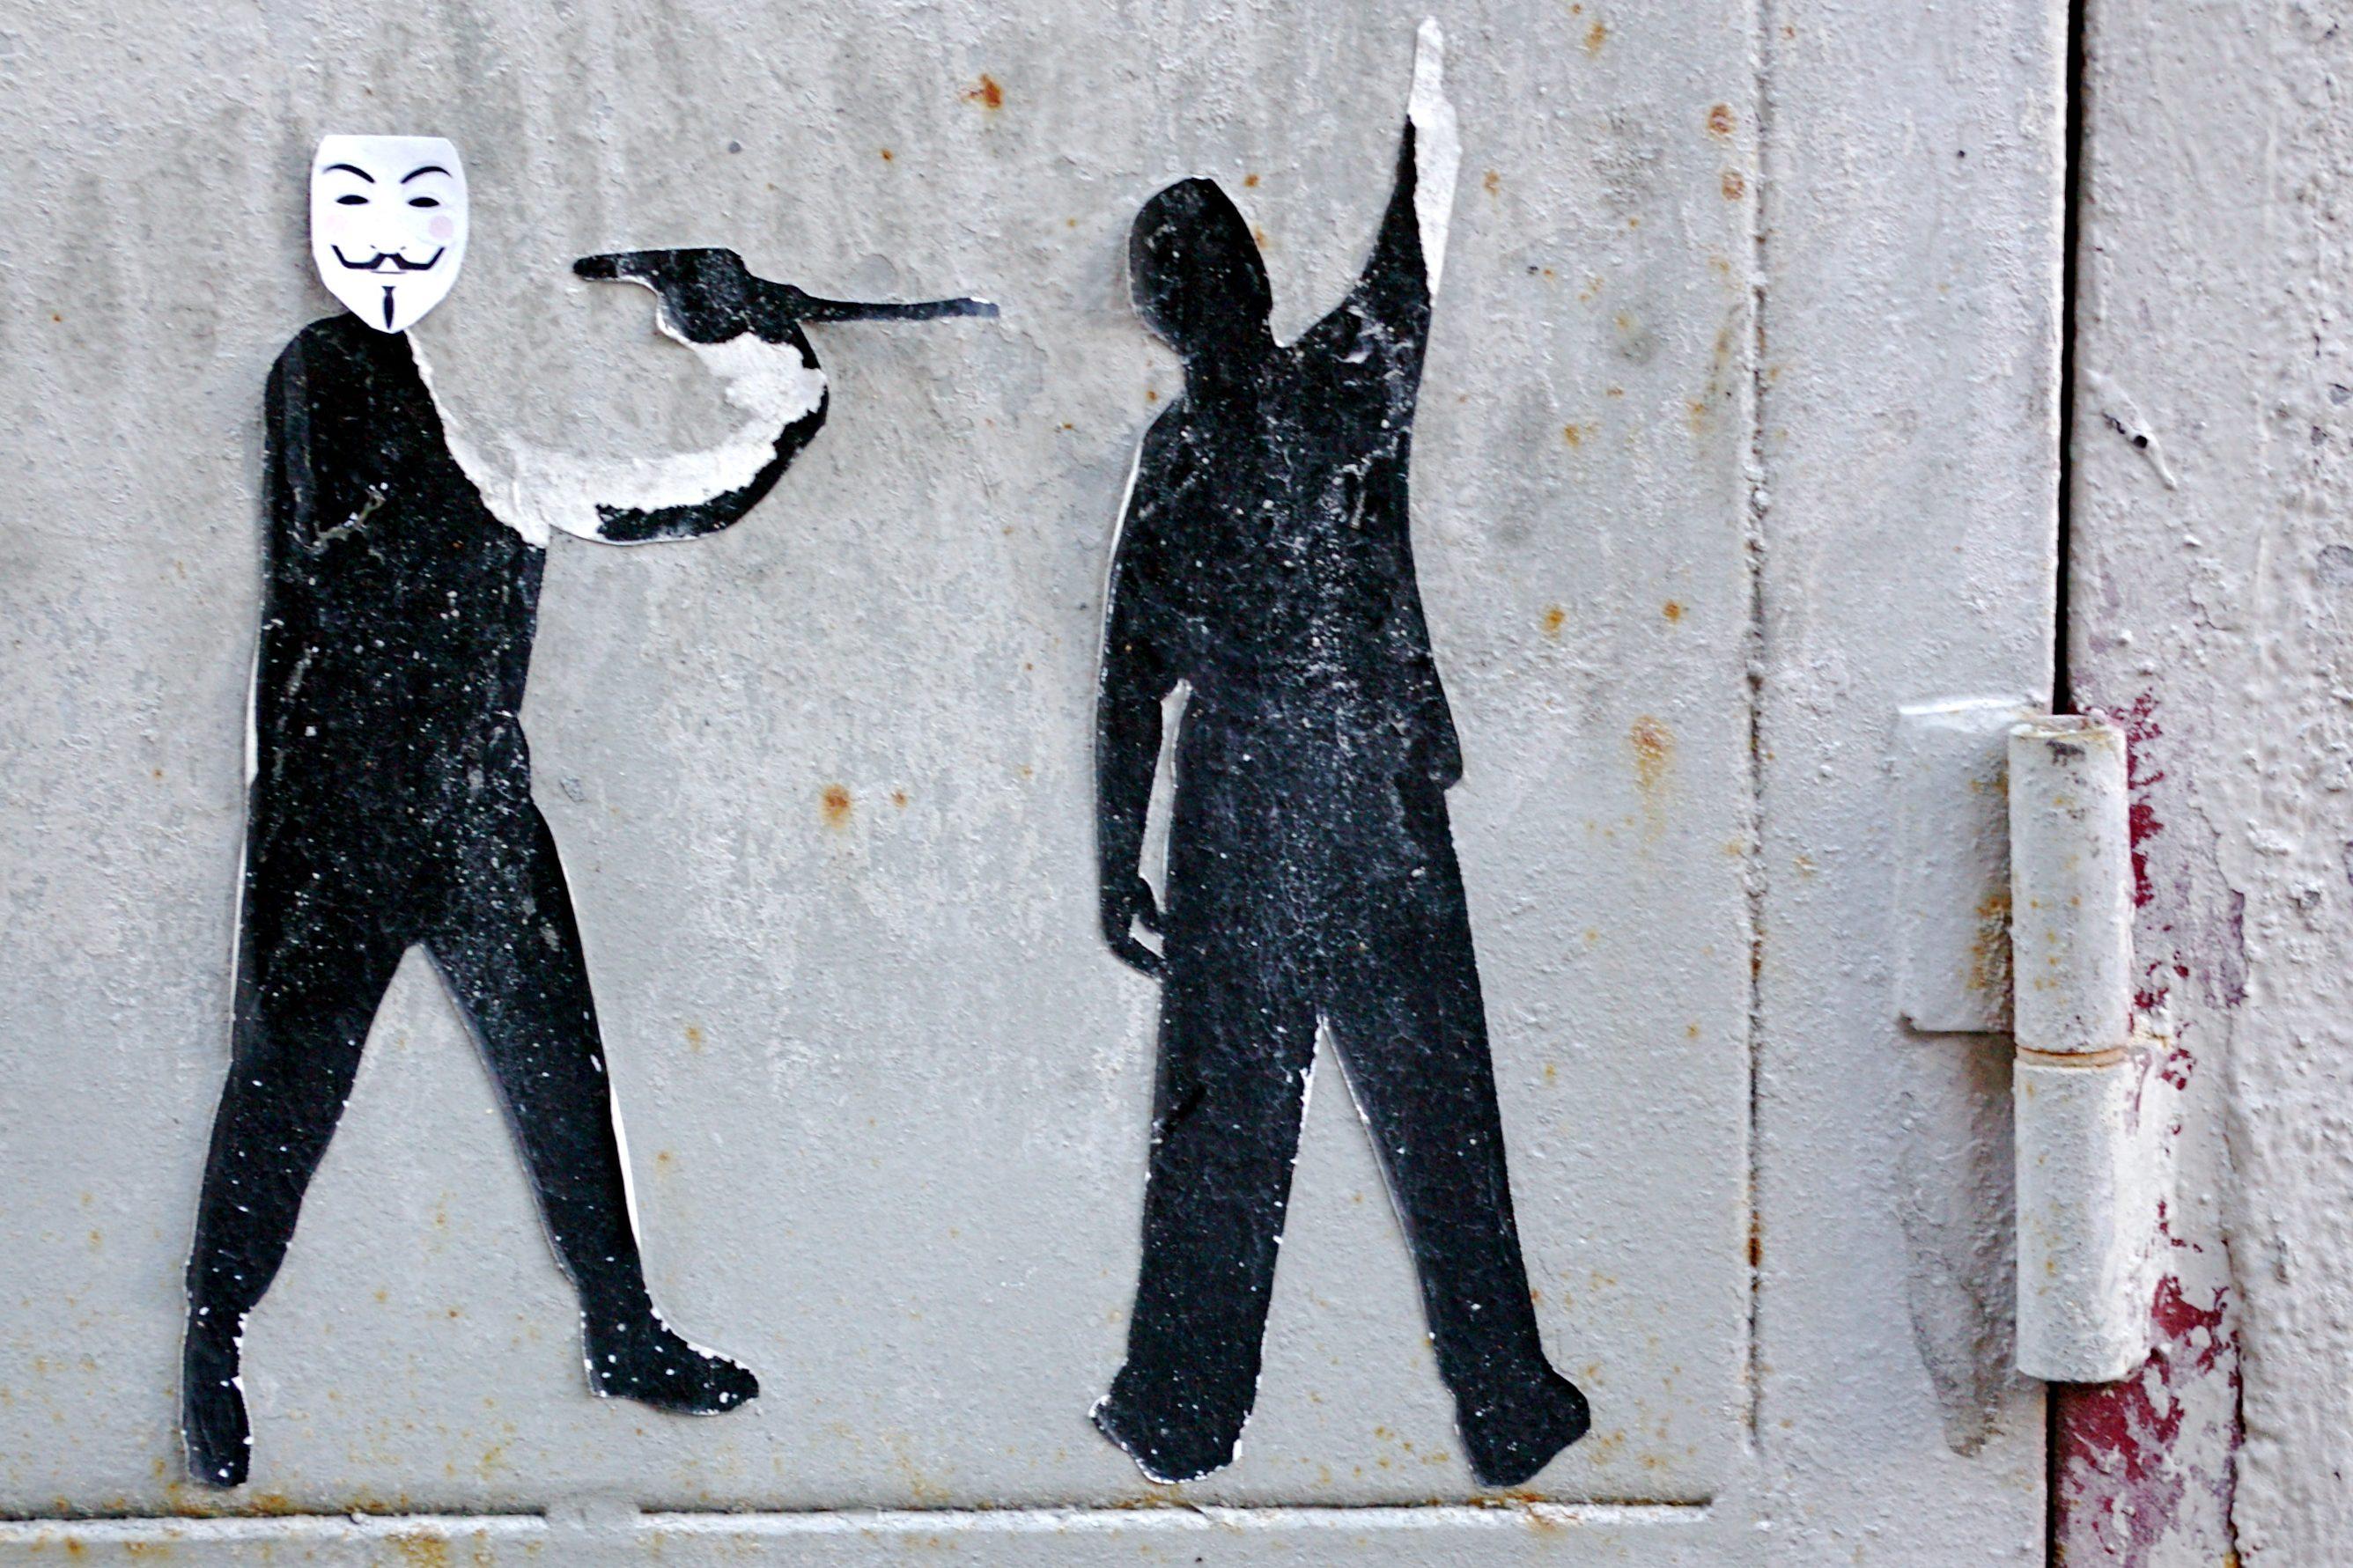 Artwork based on Anonymous mask